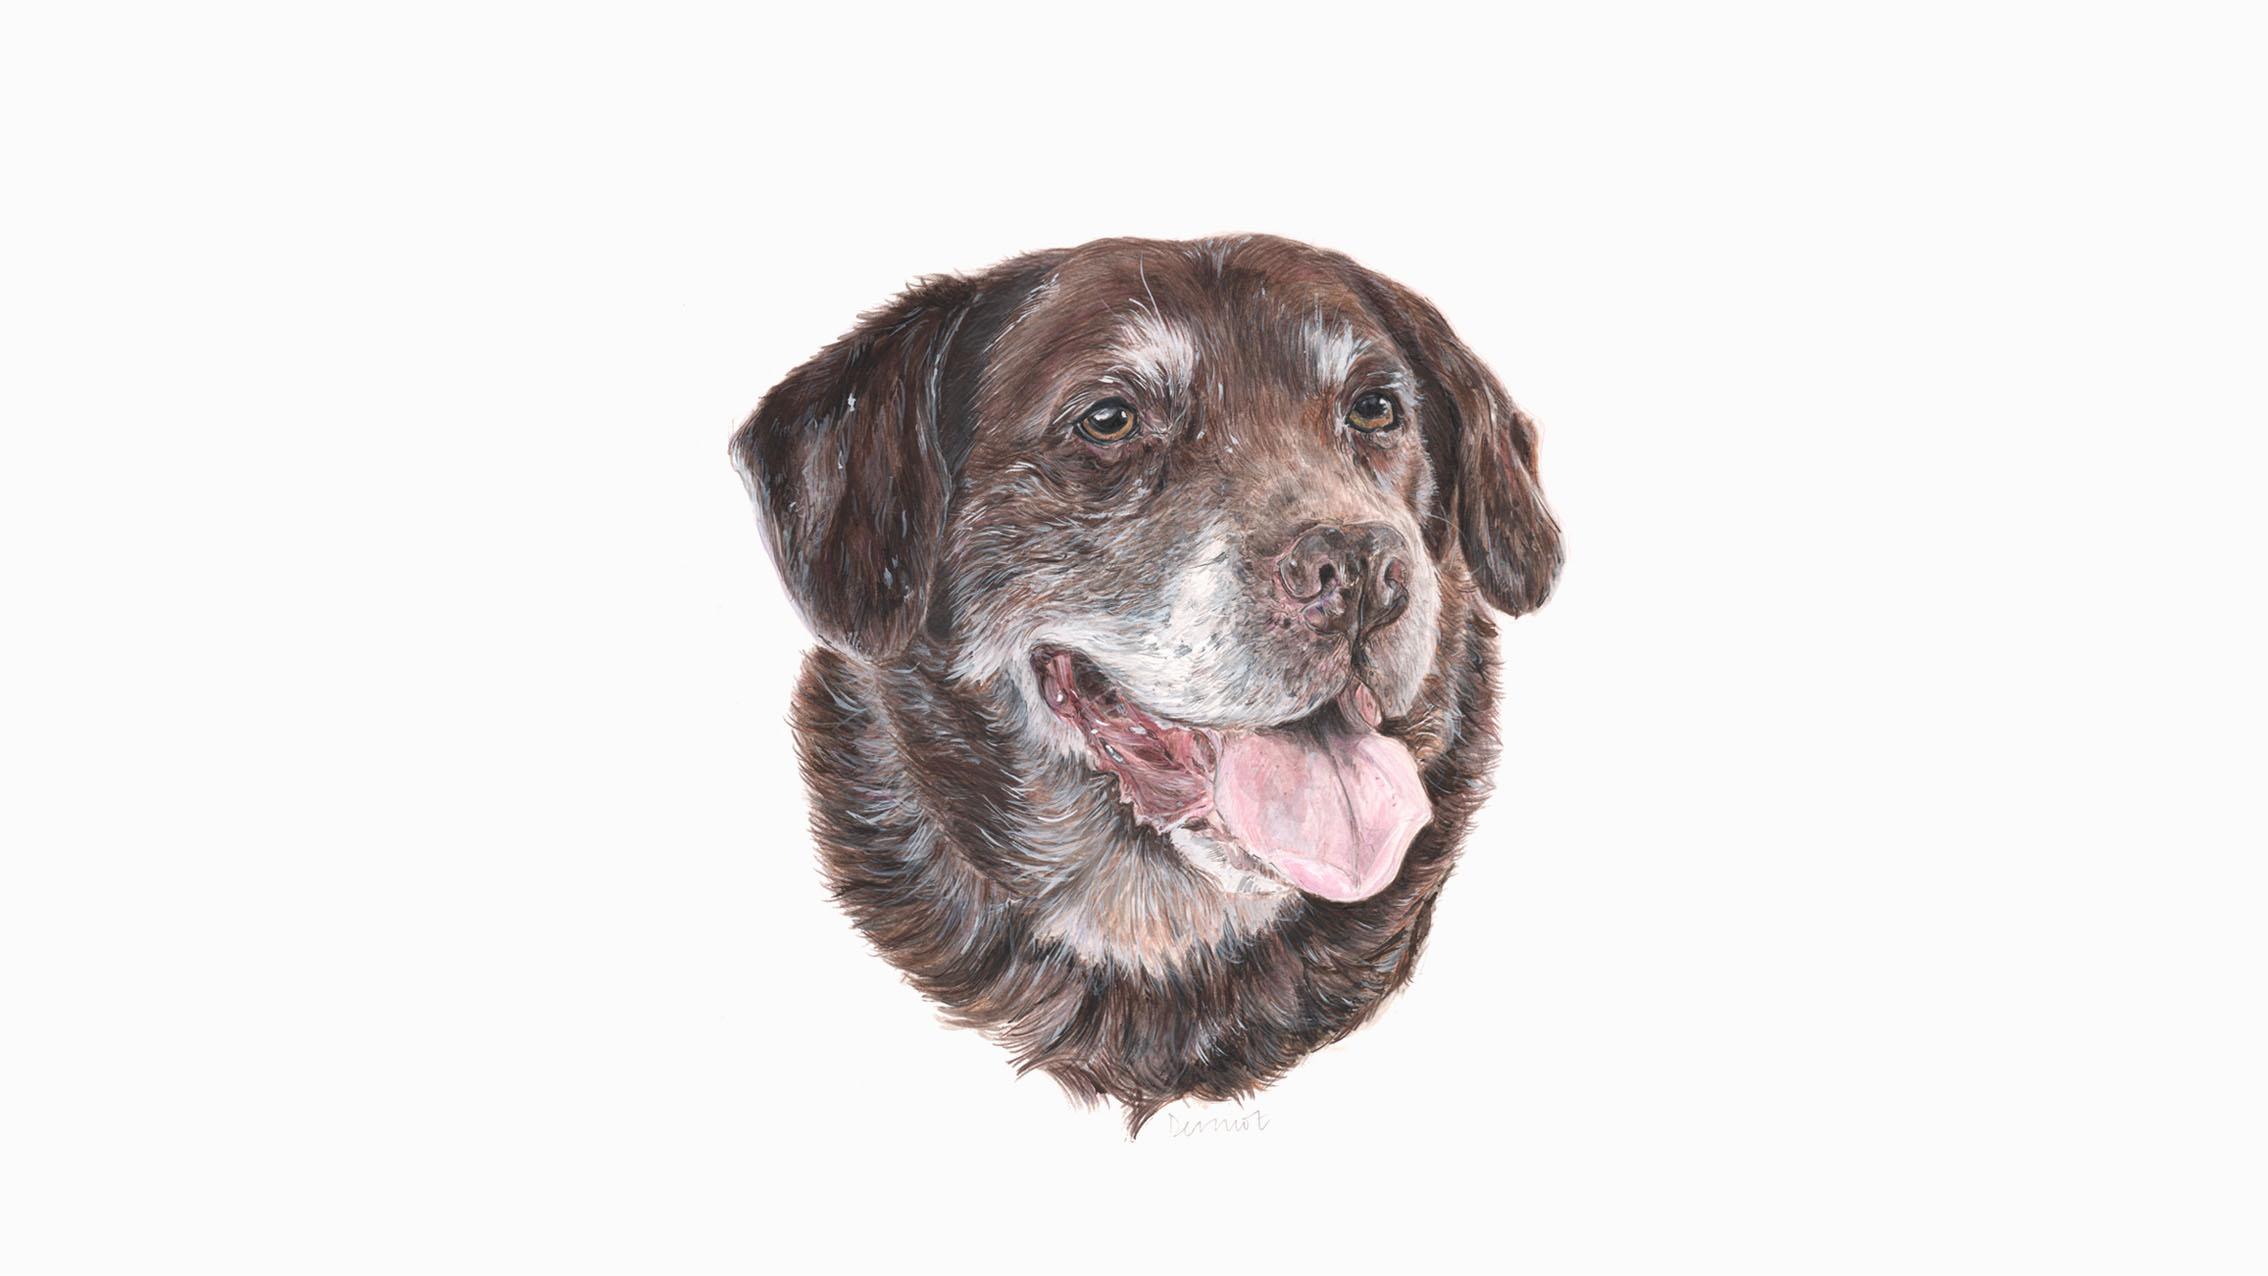 Dermot, the Chocolate Labrador